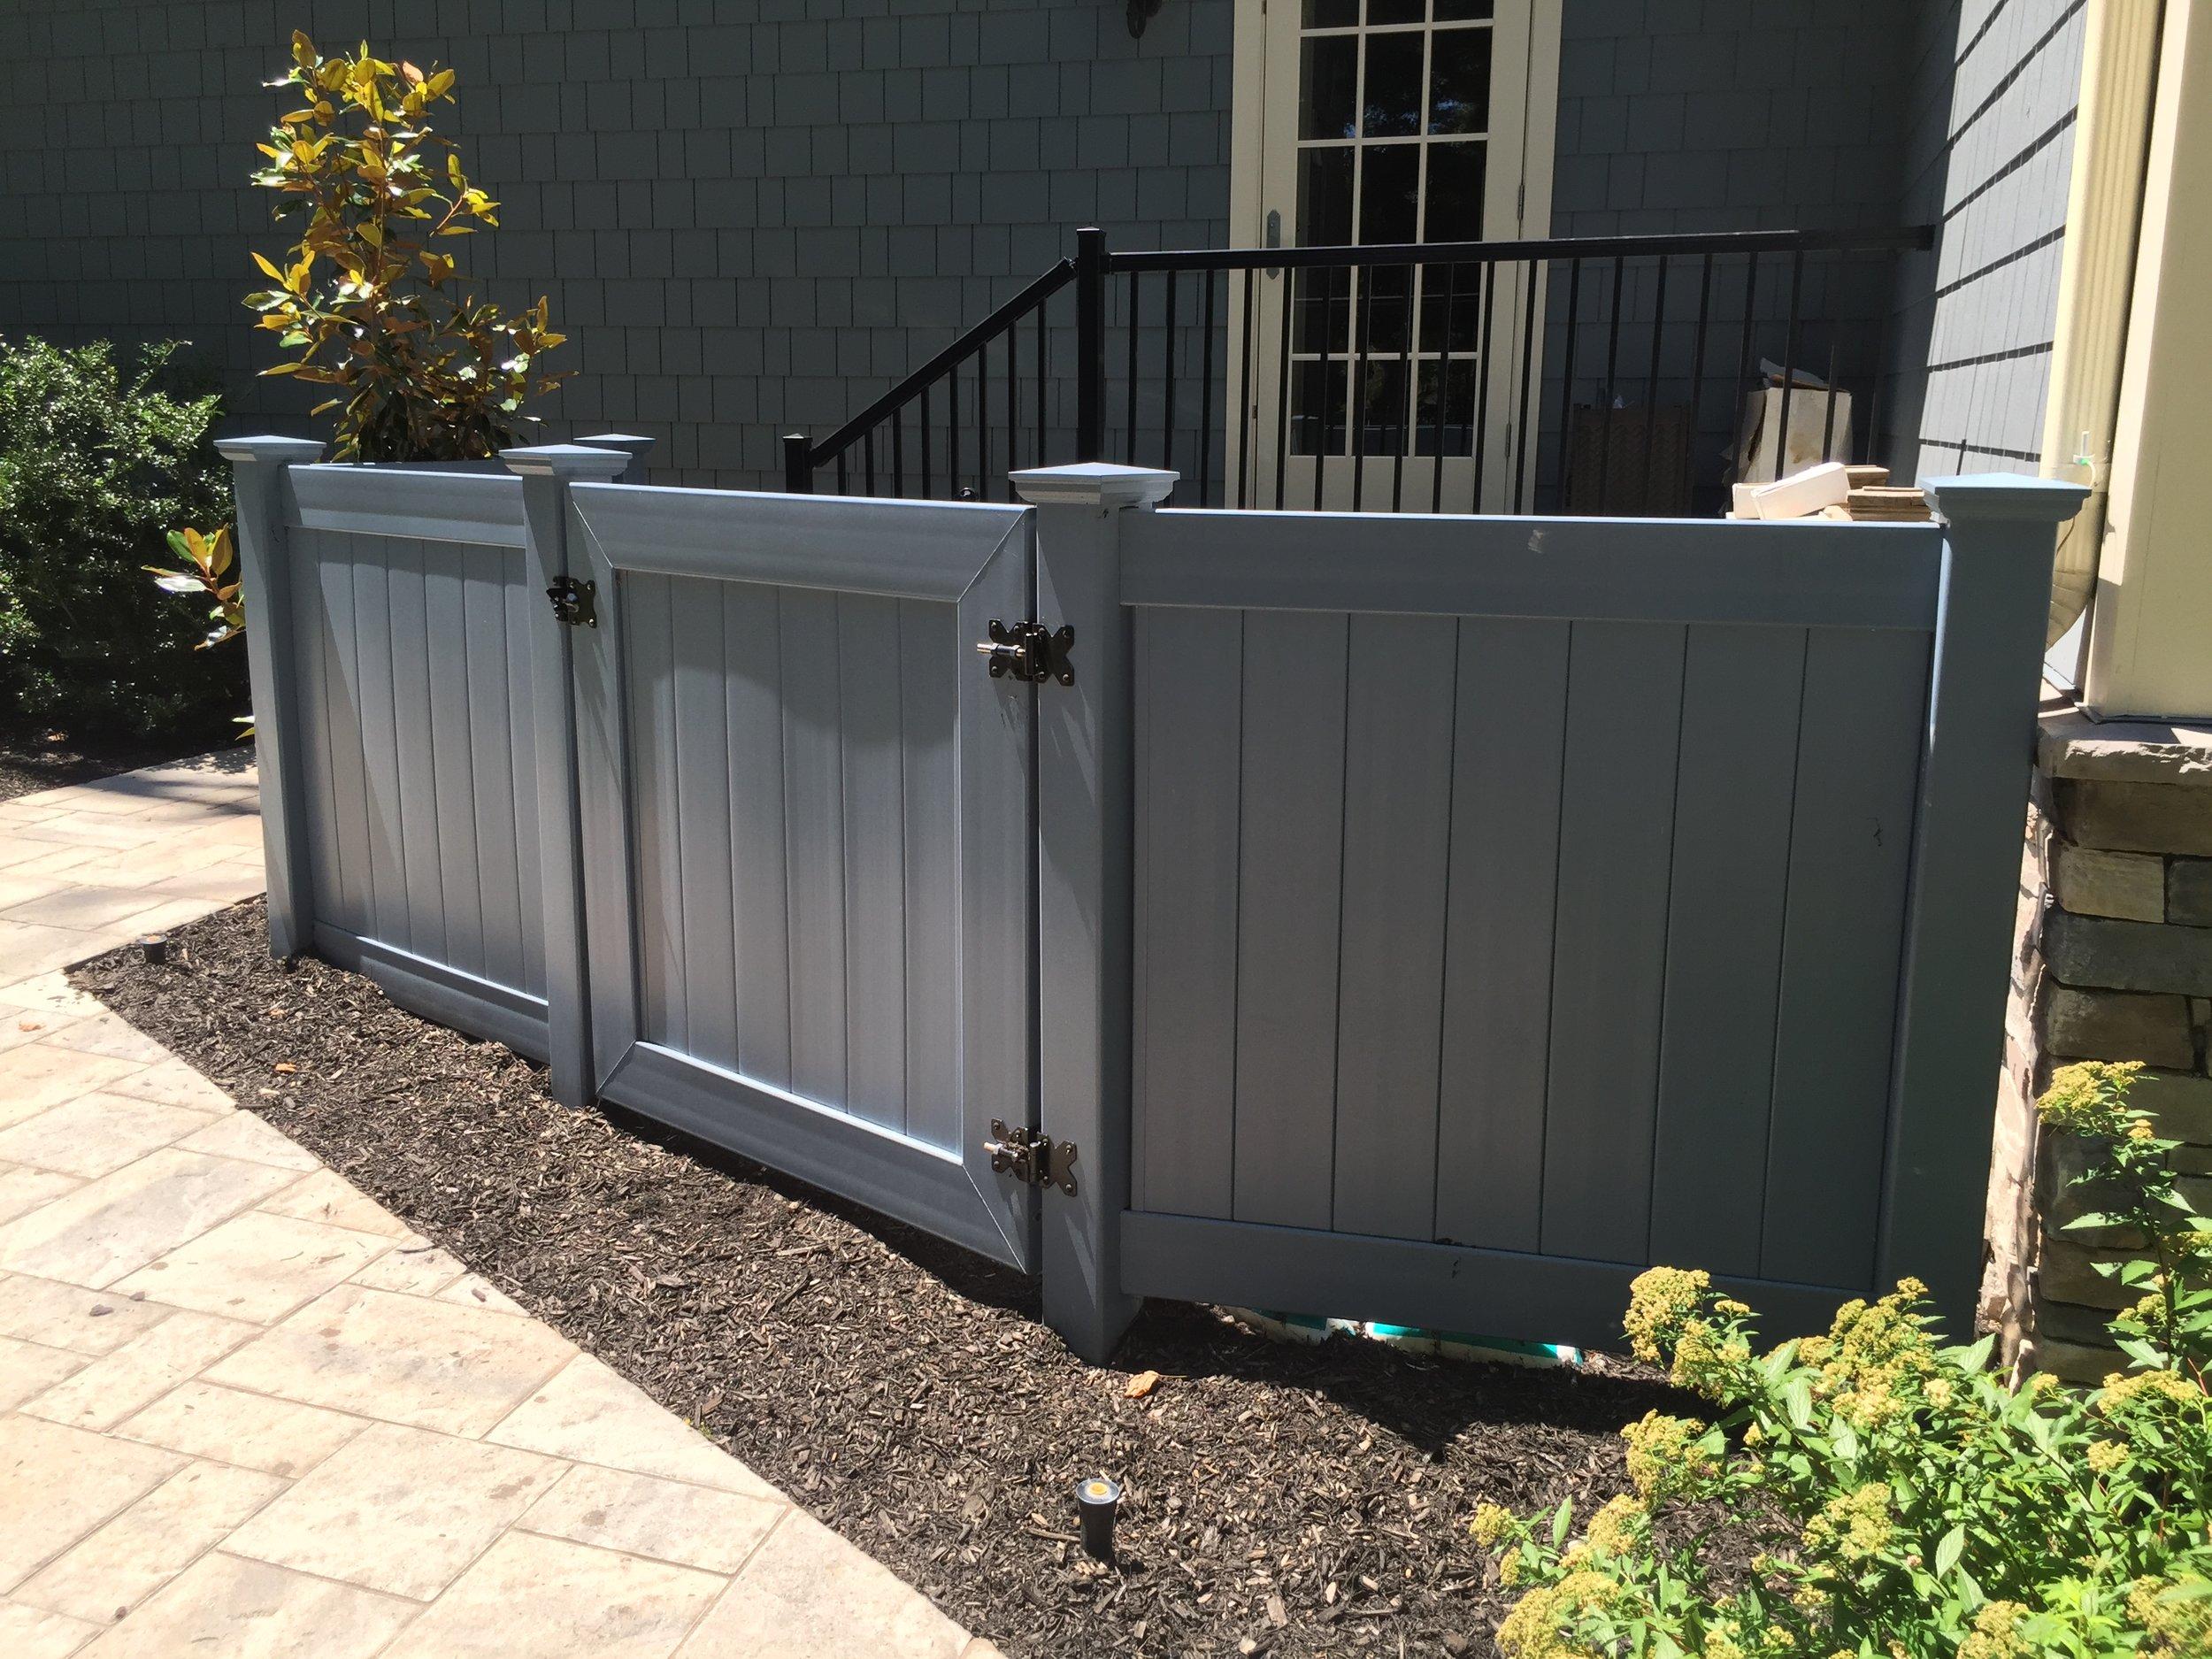 Professional vinyl fence landscape design company in Long Island, NY